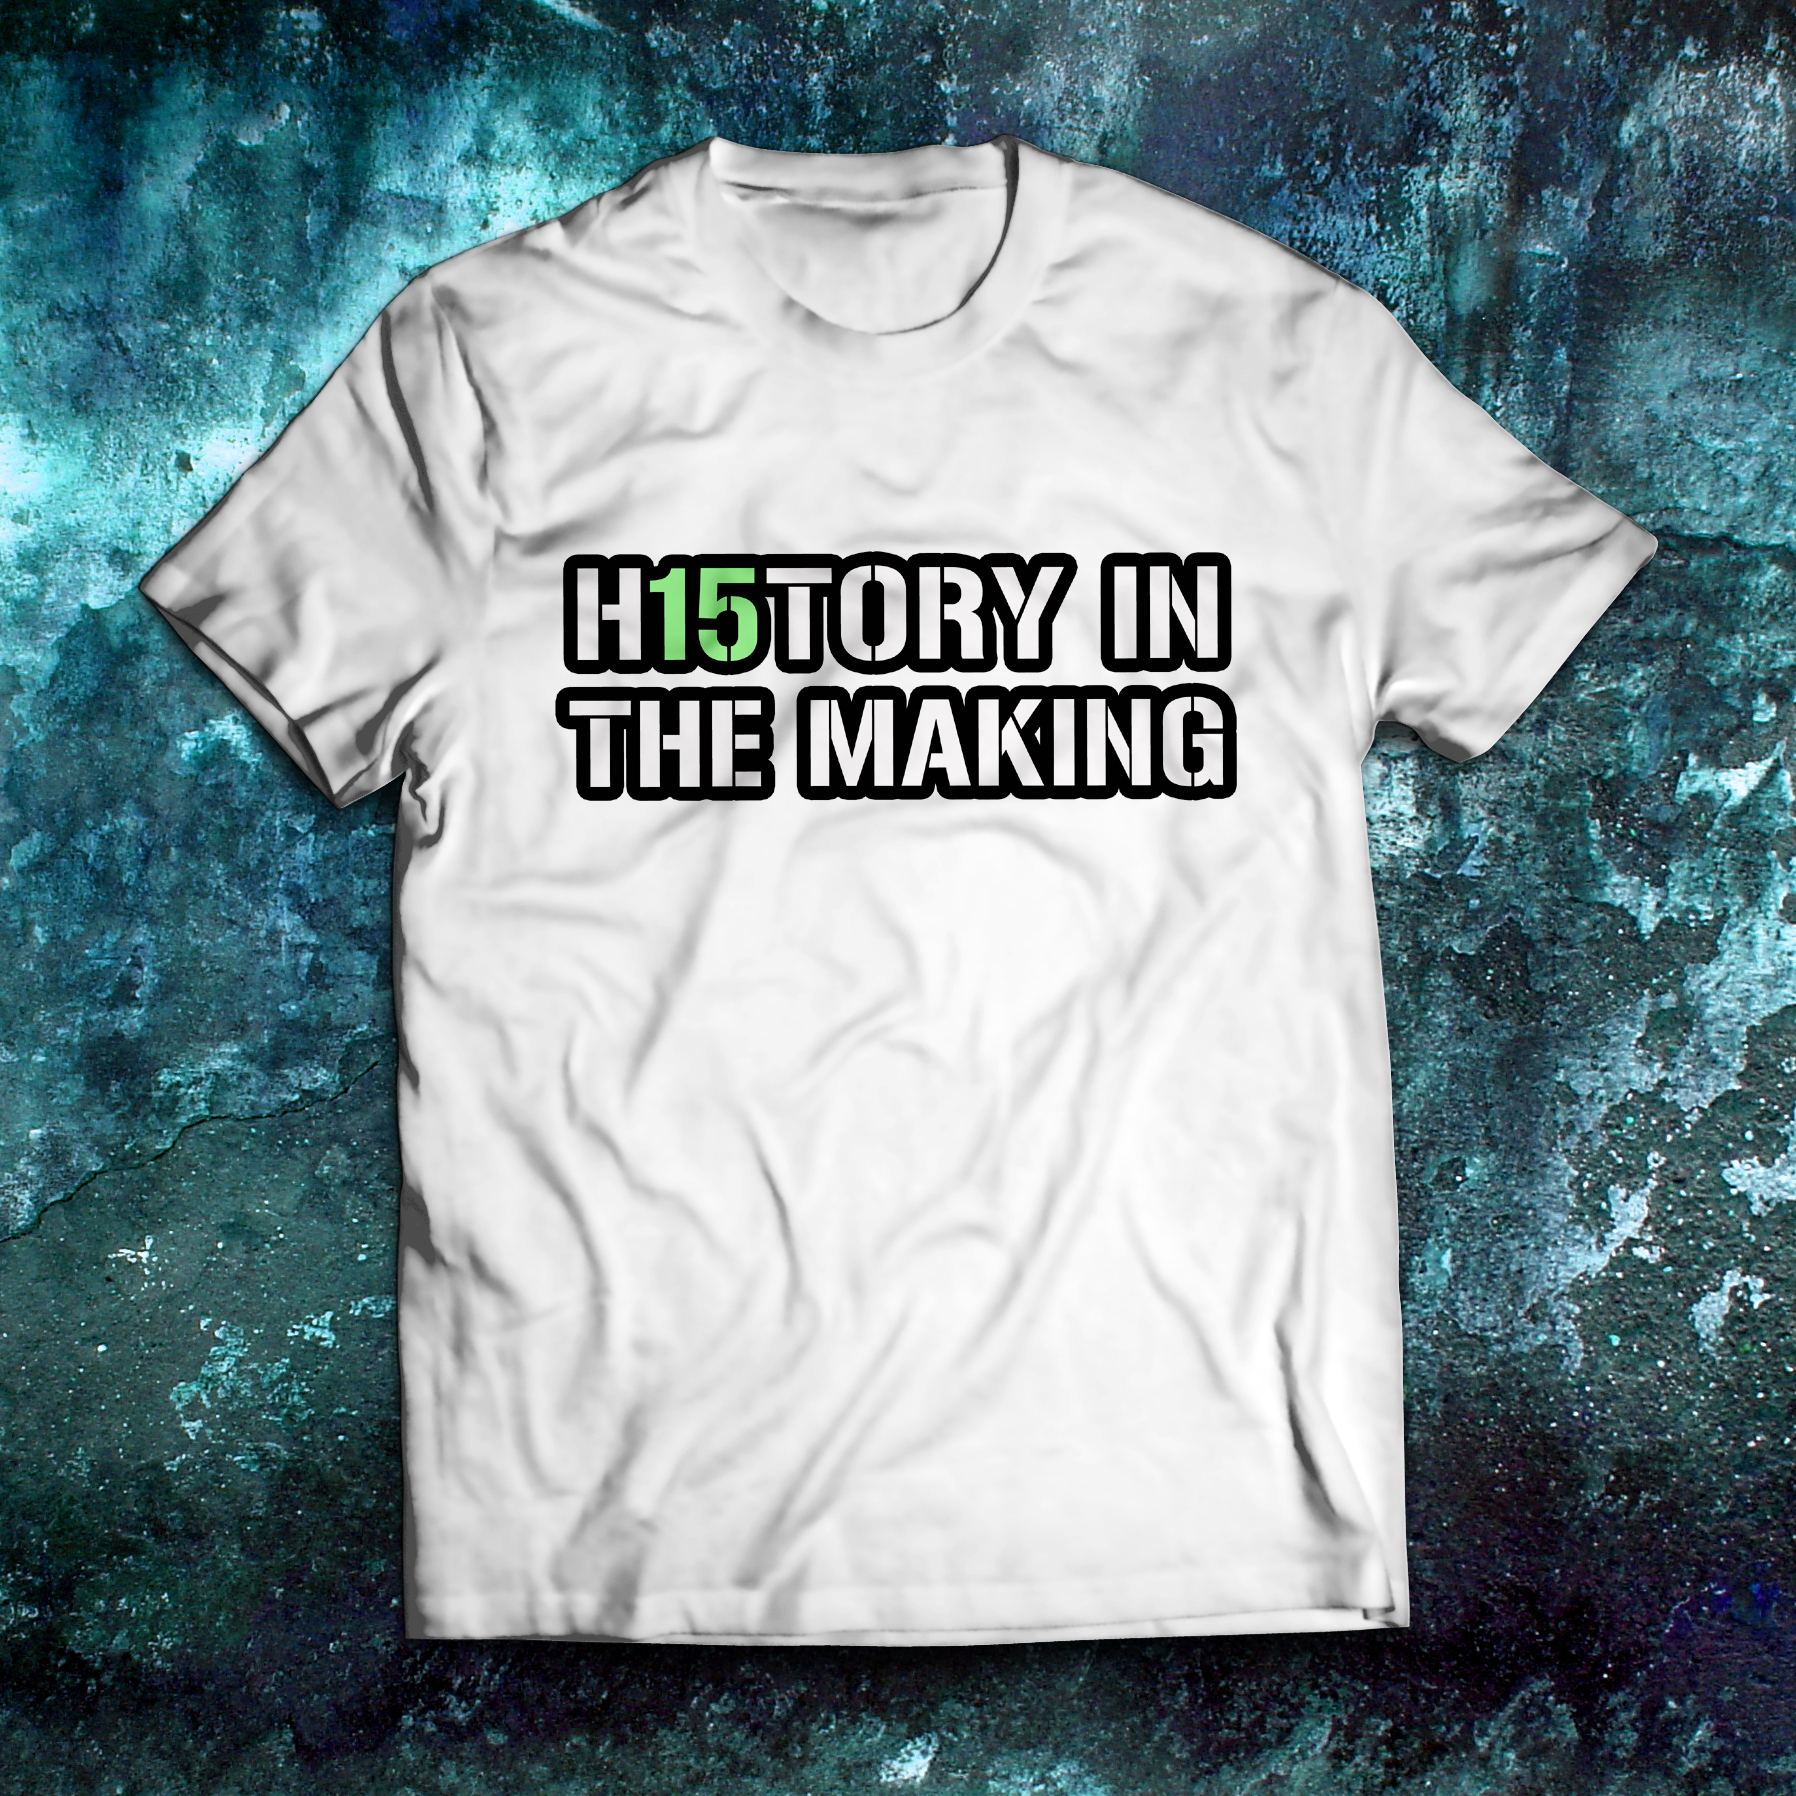 Class Of 2015 T-Shirts & Shirt Designs | Zazzle